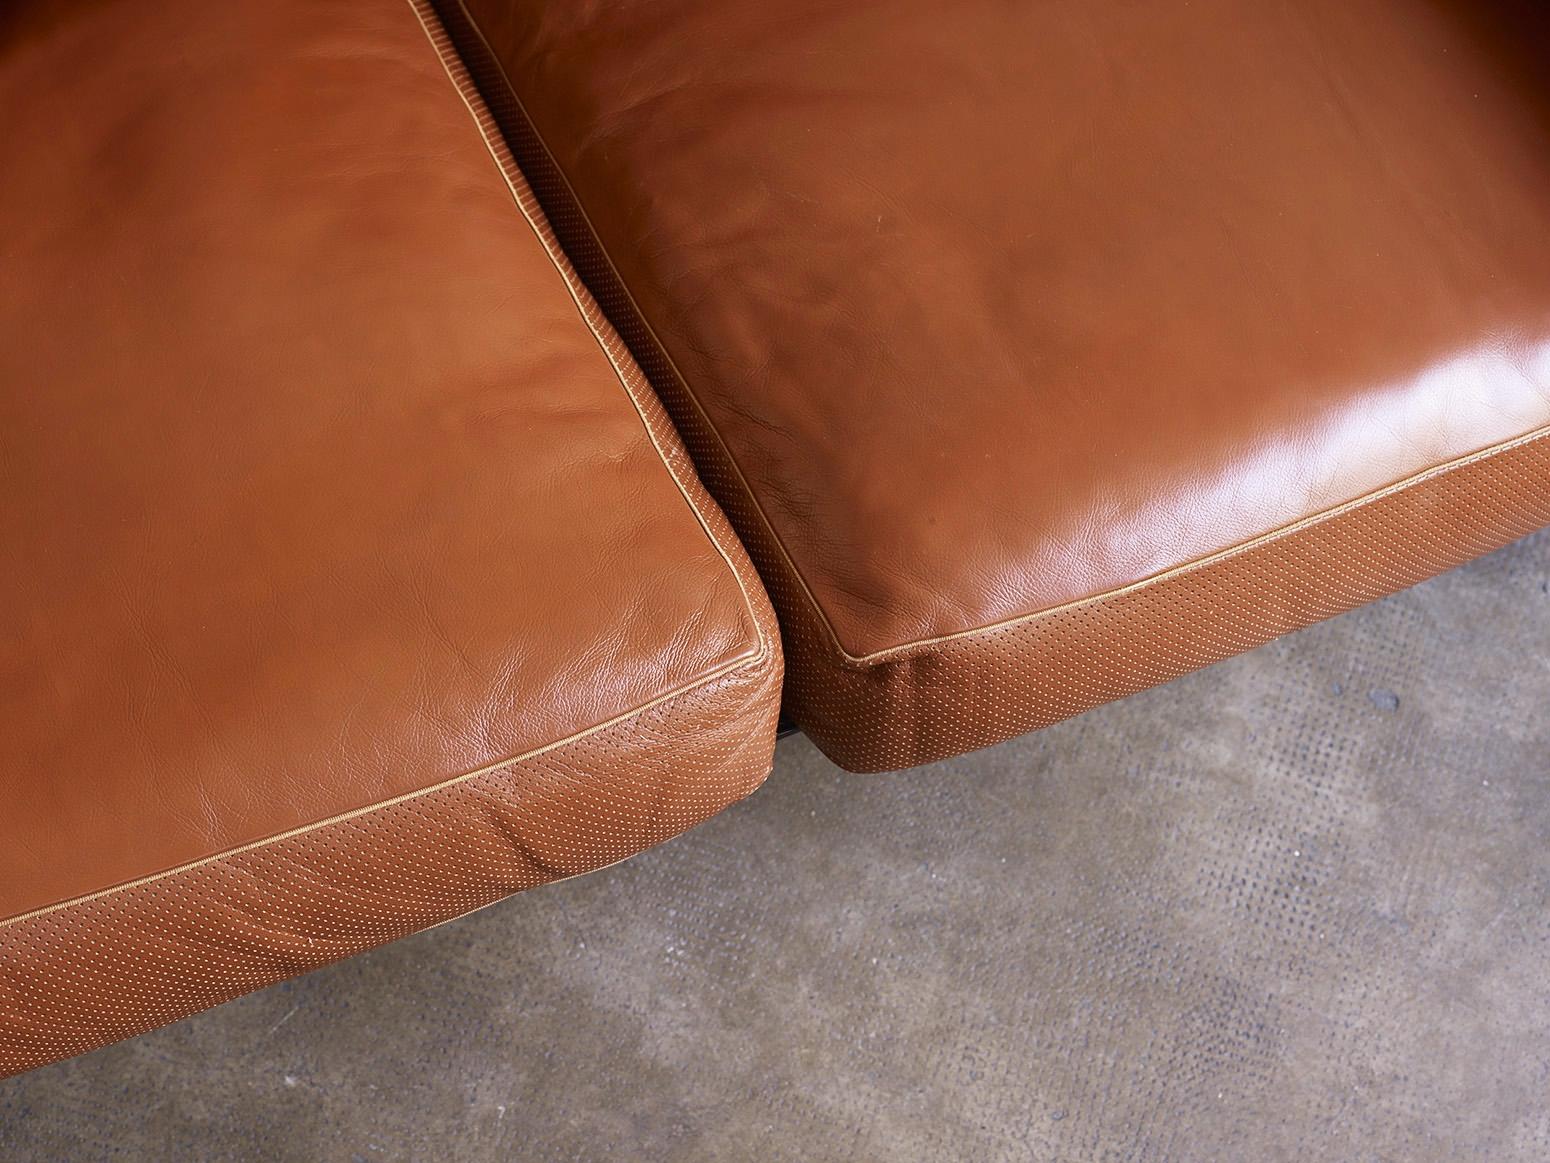 sofa-diesis-a-citterio-bb-italia-image-05